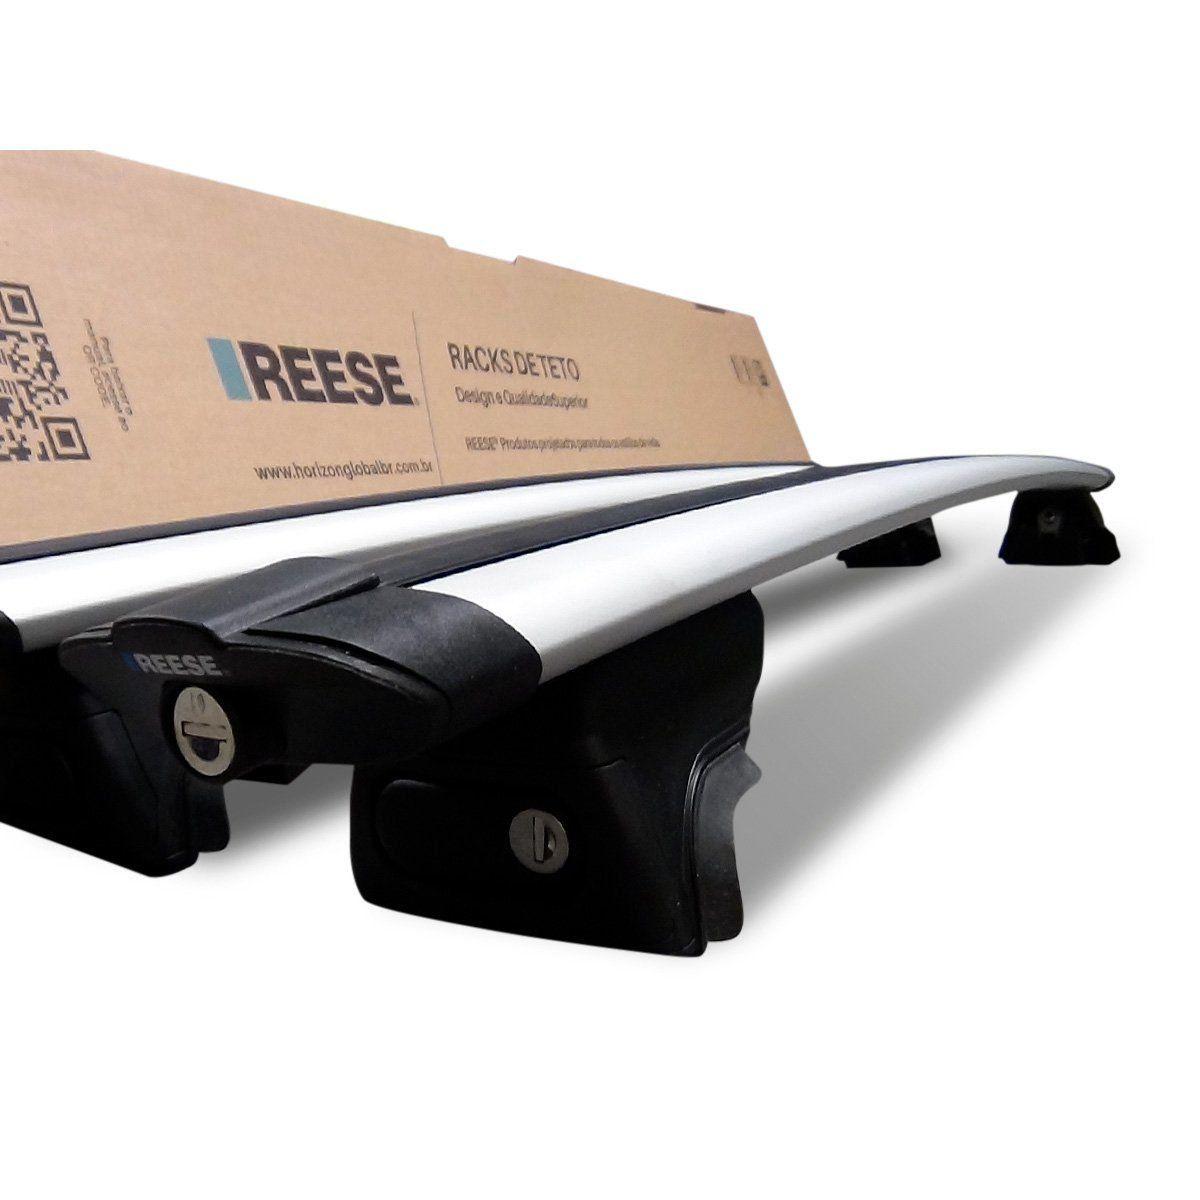 Rack de Teto Bagageiro Compass Creta SW4 Sorento e Soul Prata Reese Premium